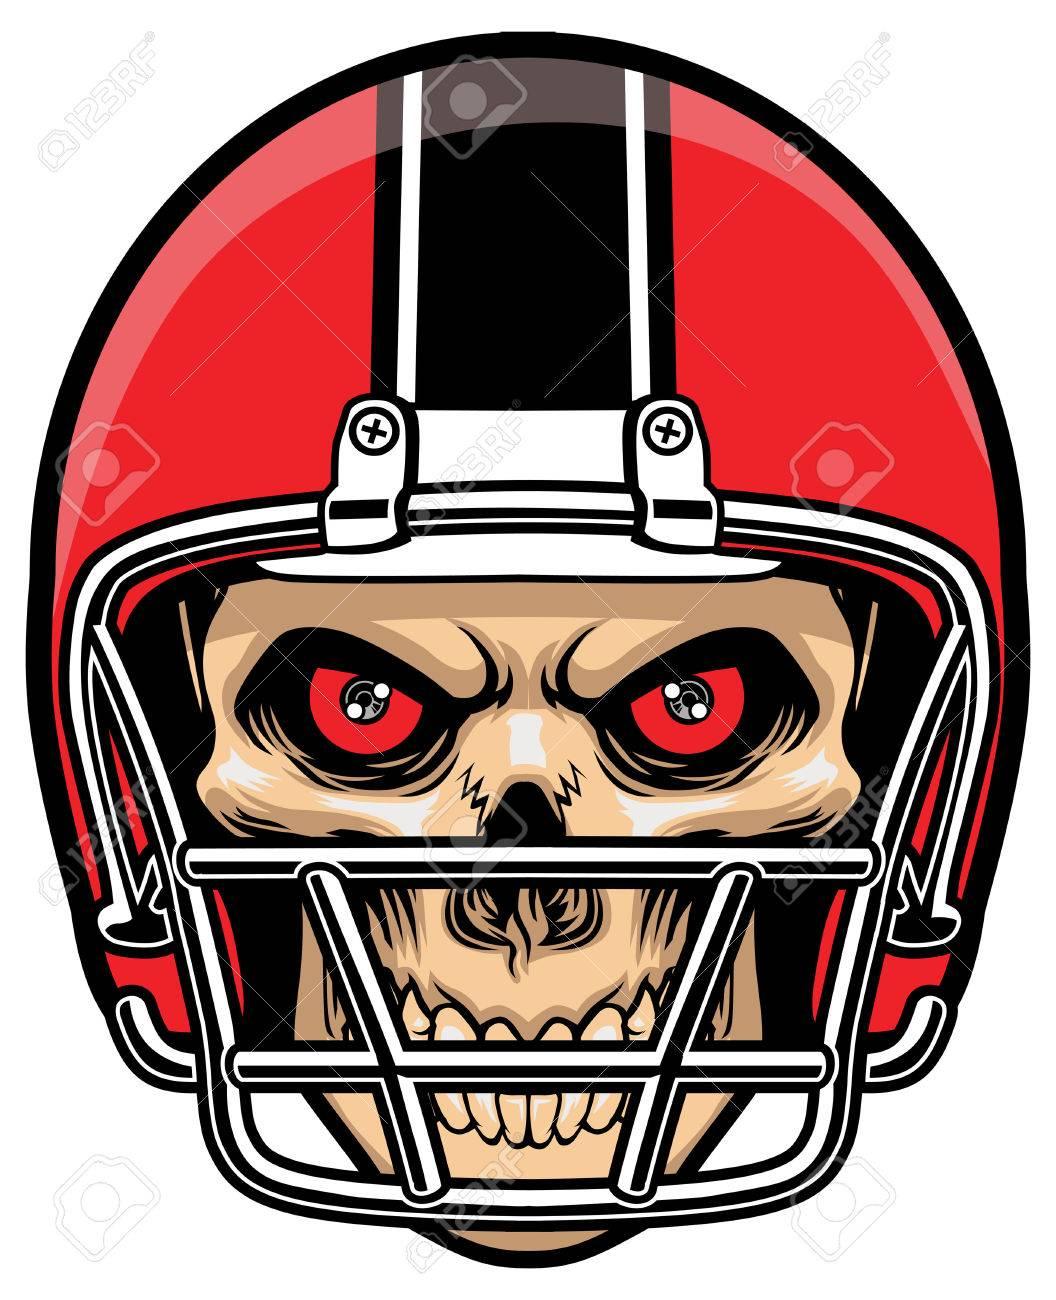 skull of football player wearing a helmet - 59267190